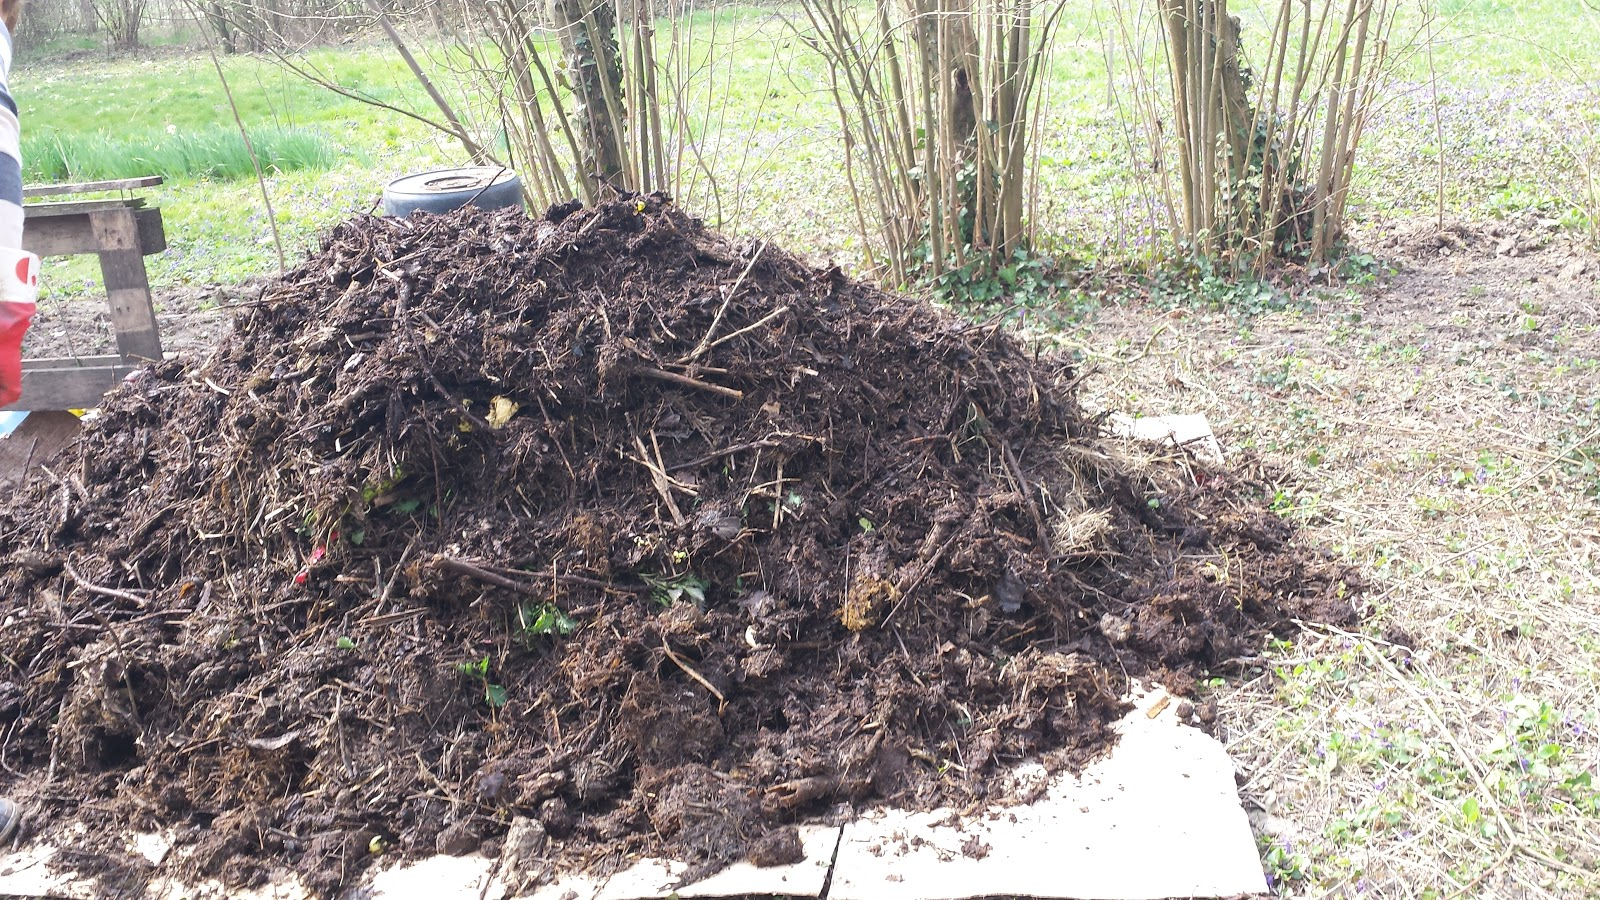 Osnove organskog vrtlarenja 1. - dio